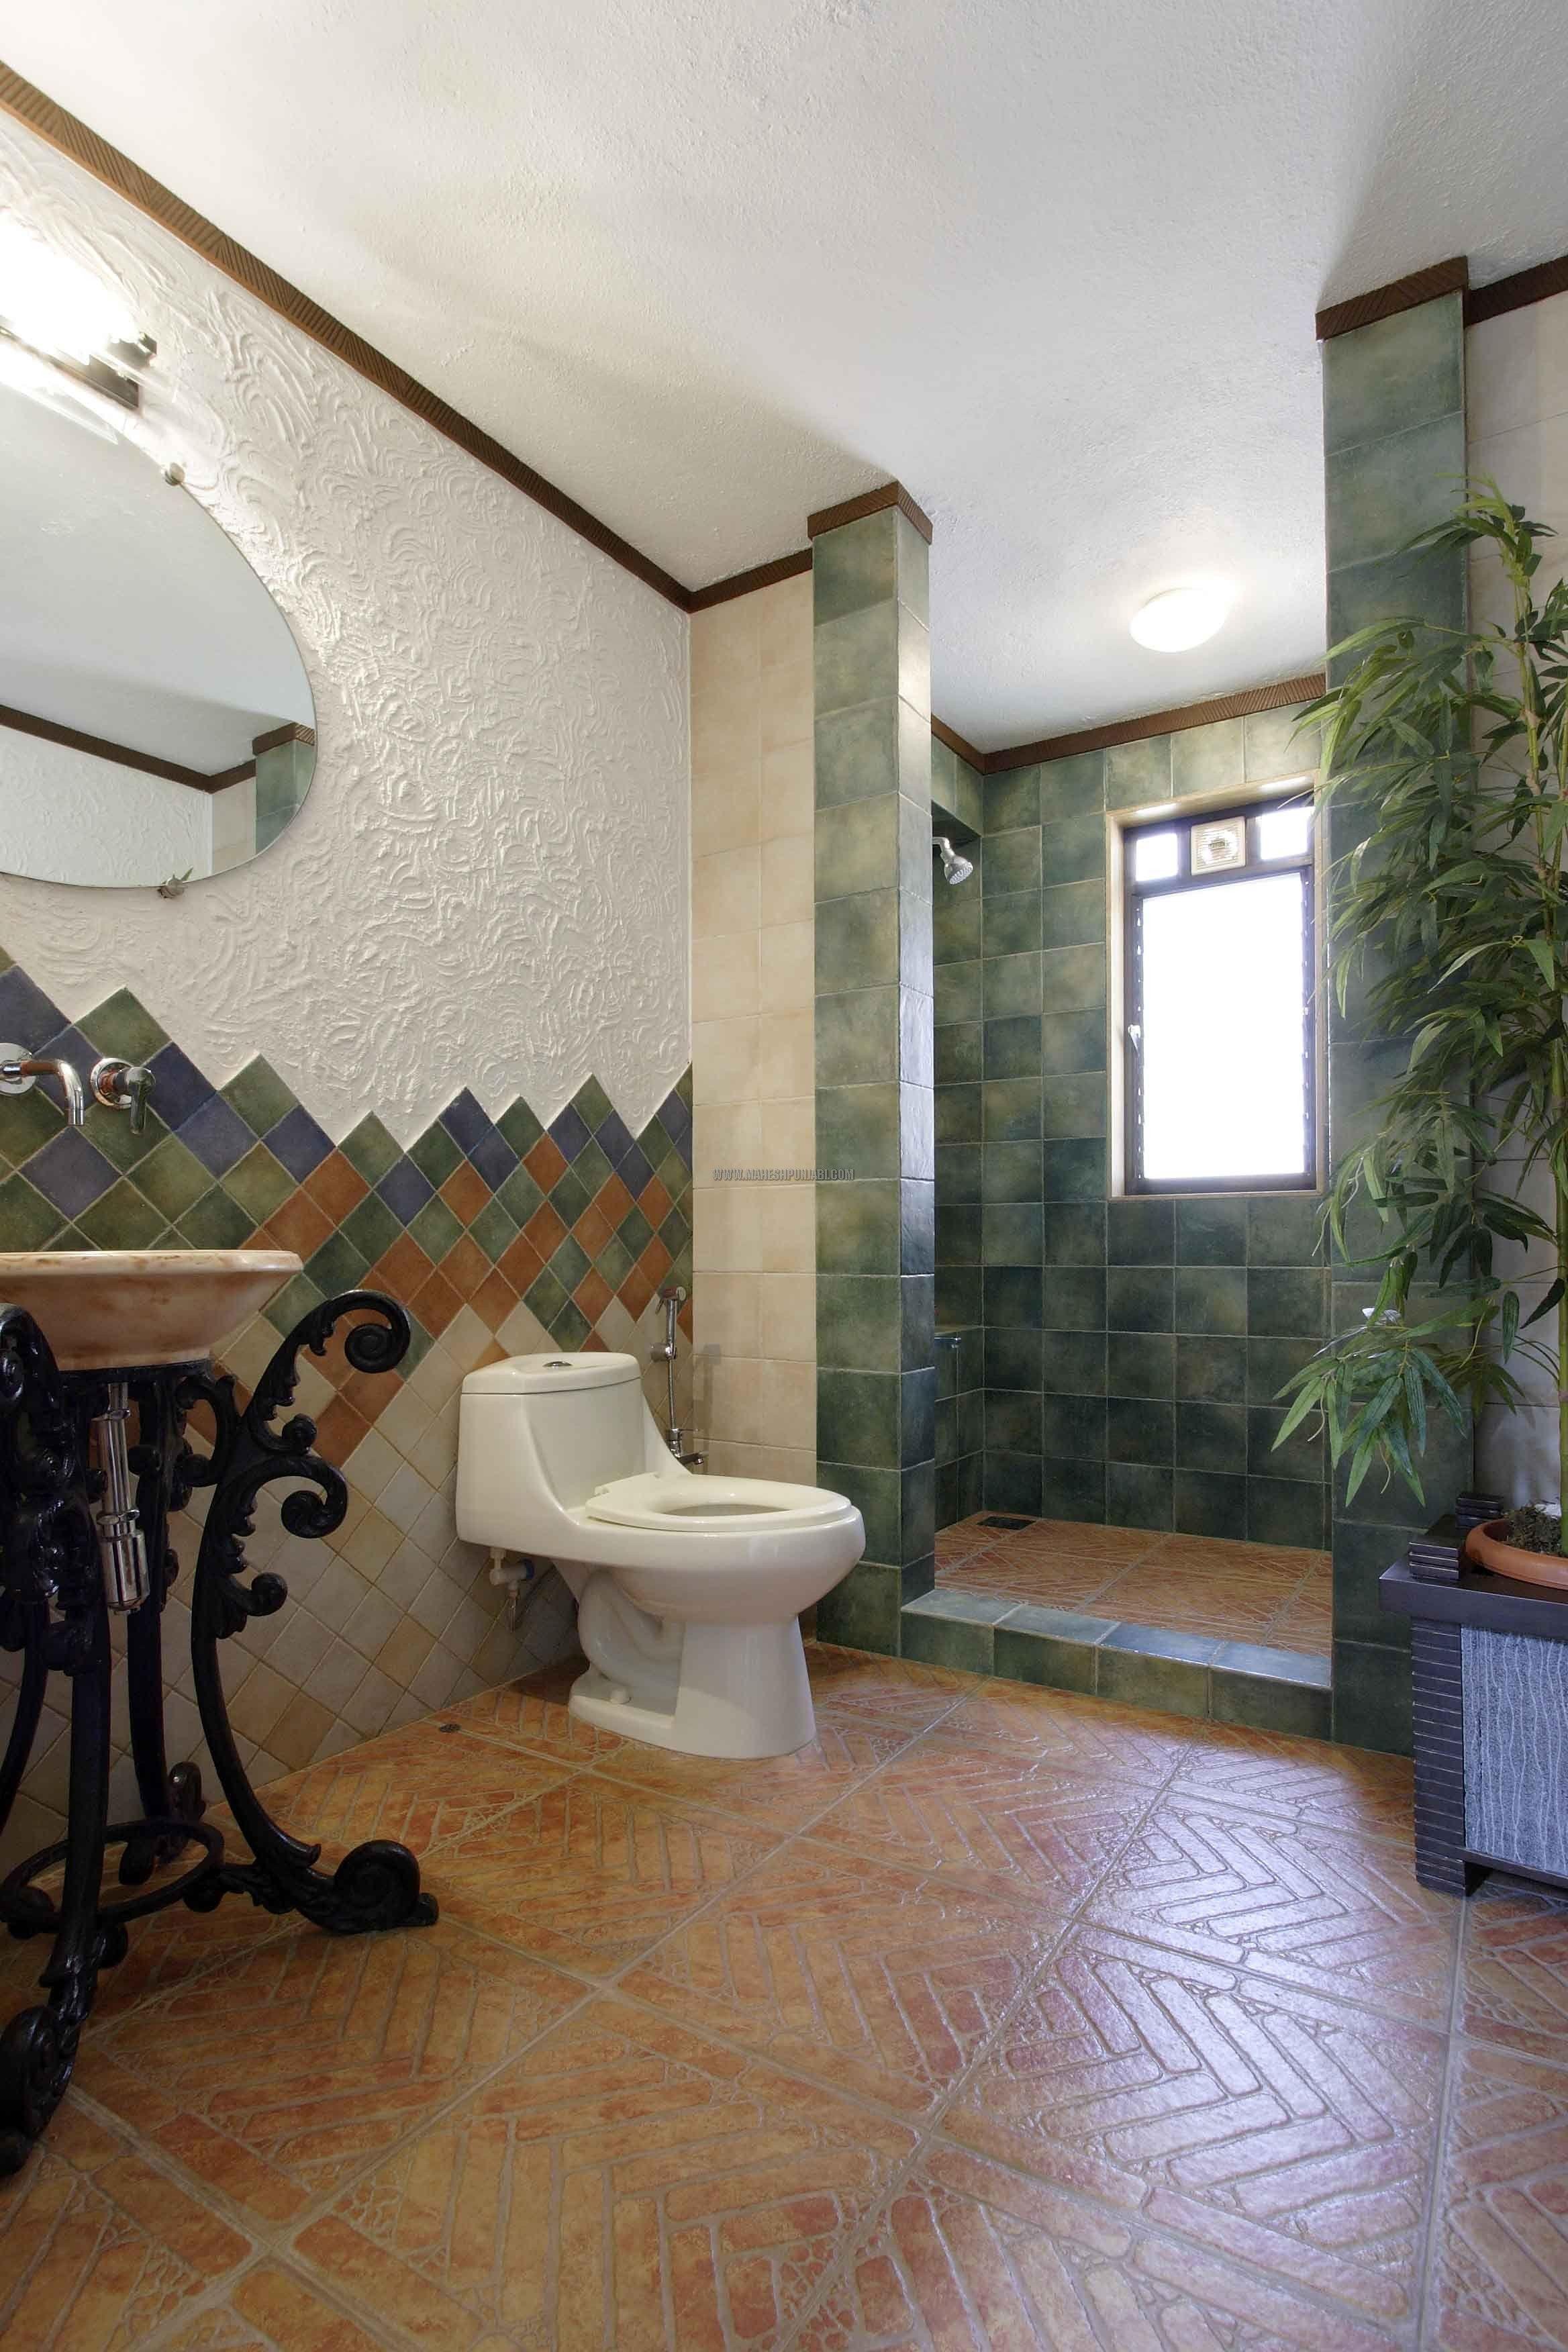 Inspiration Latest Bathroom Tiles Design In India. Bathroom designs by Mahesh Punjabi Associates  Image 10 maheshpunjabiassociates interiorupdates interiortrends